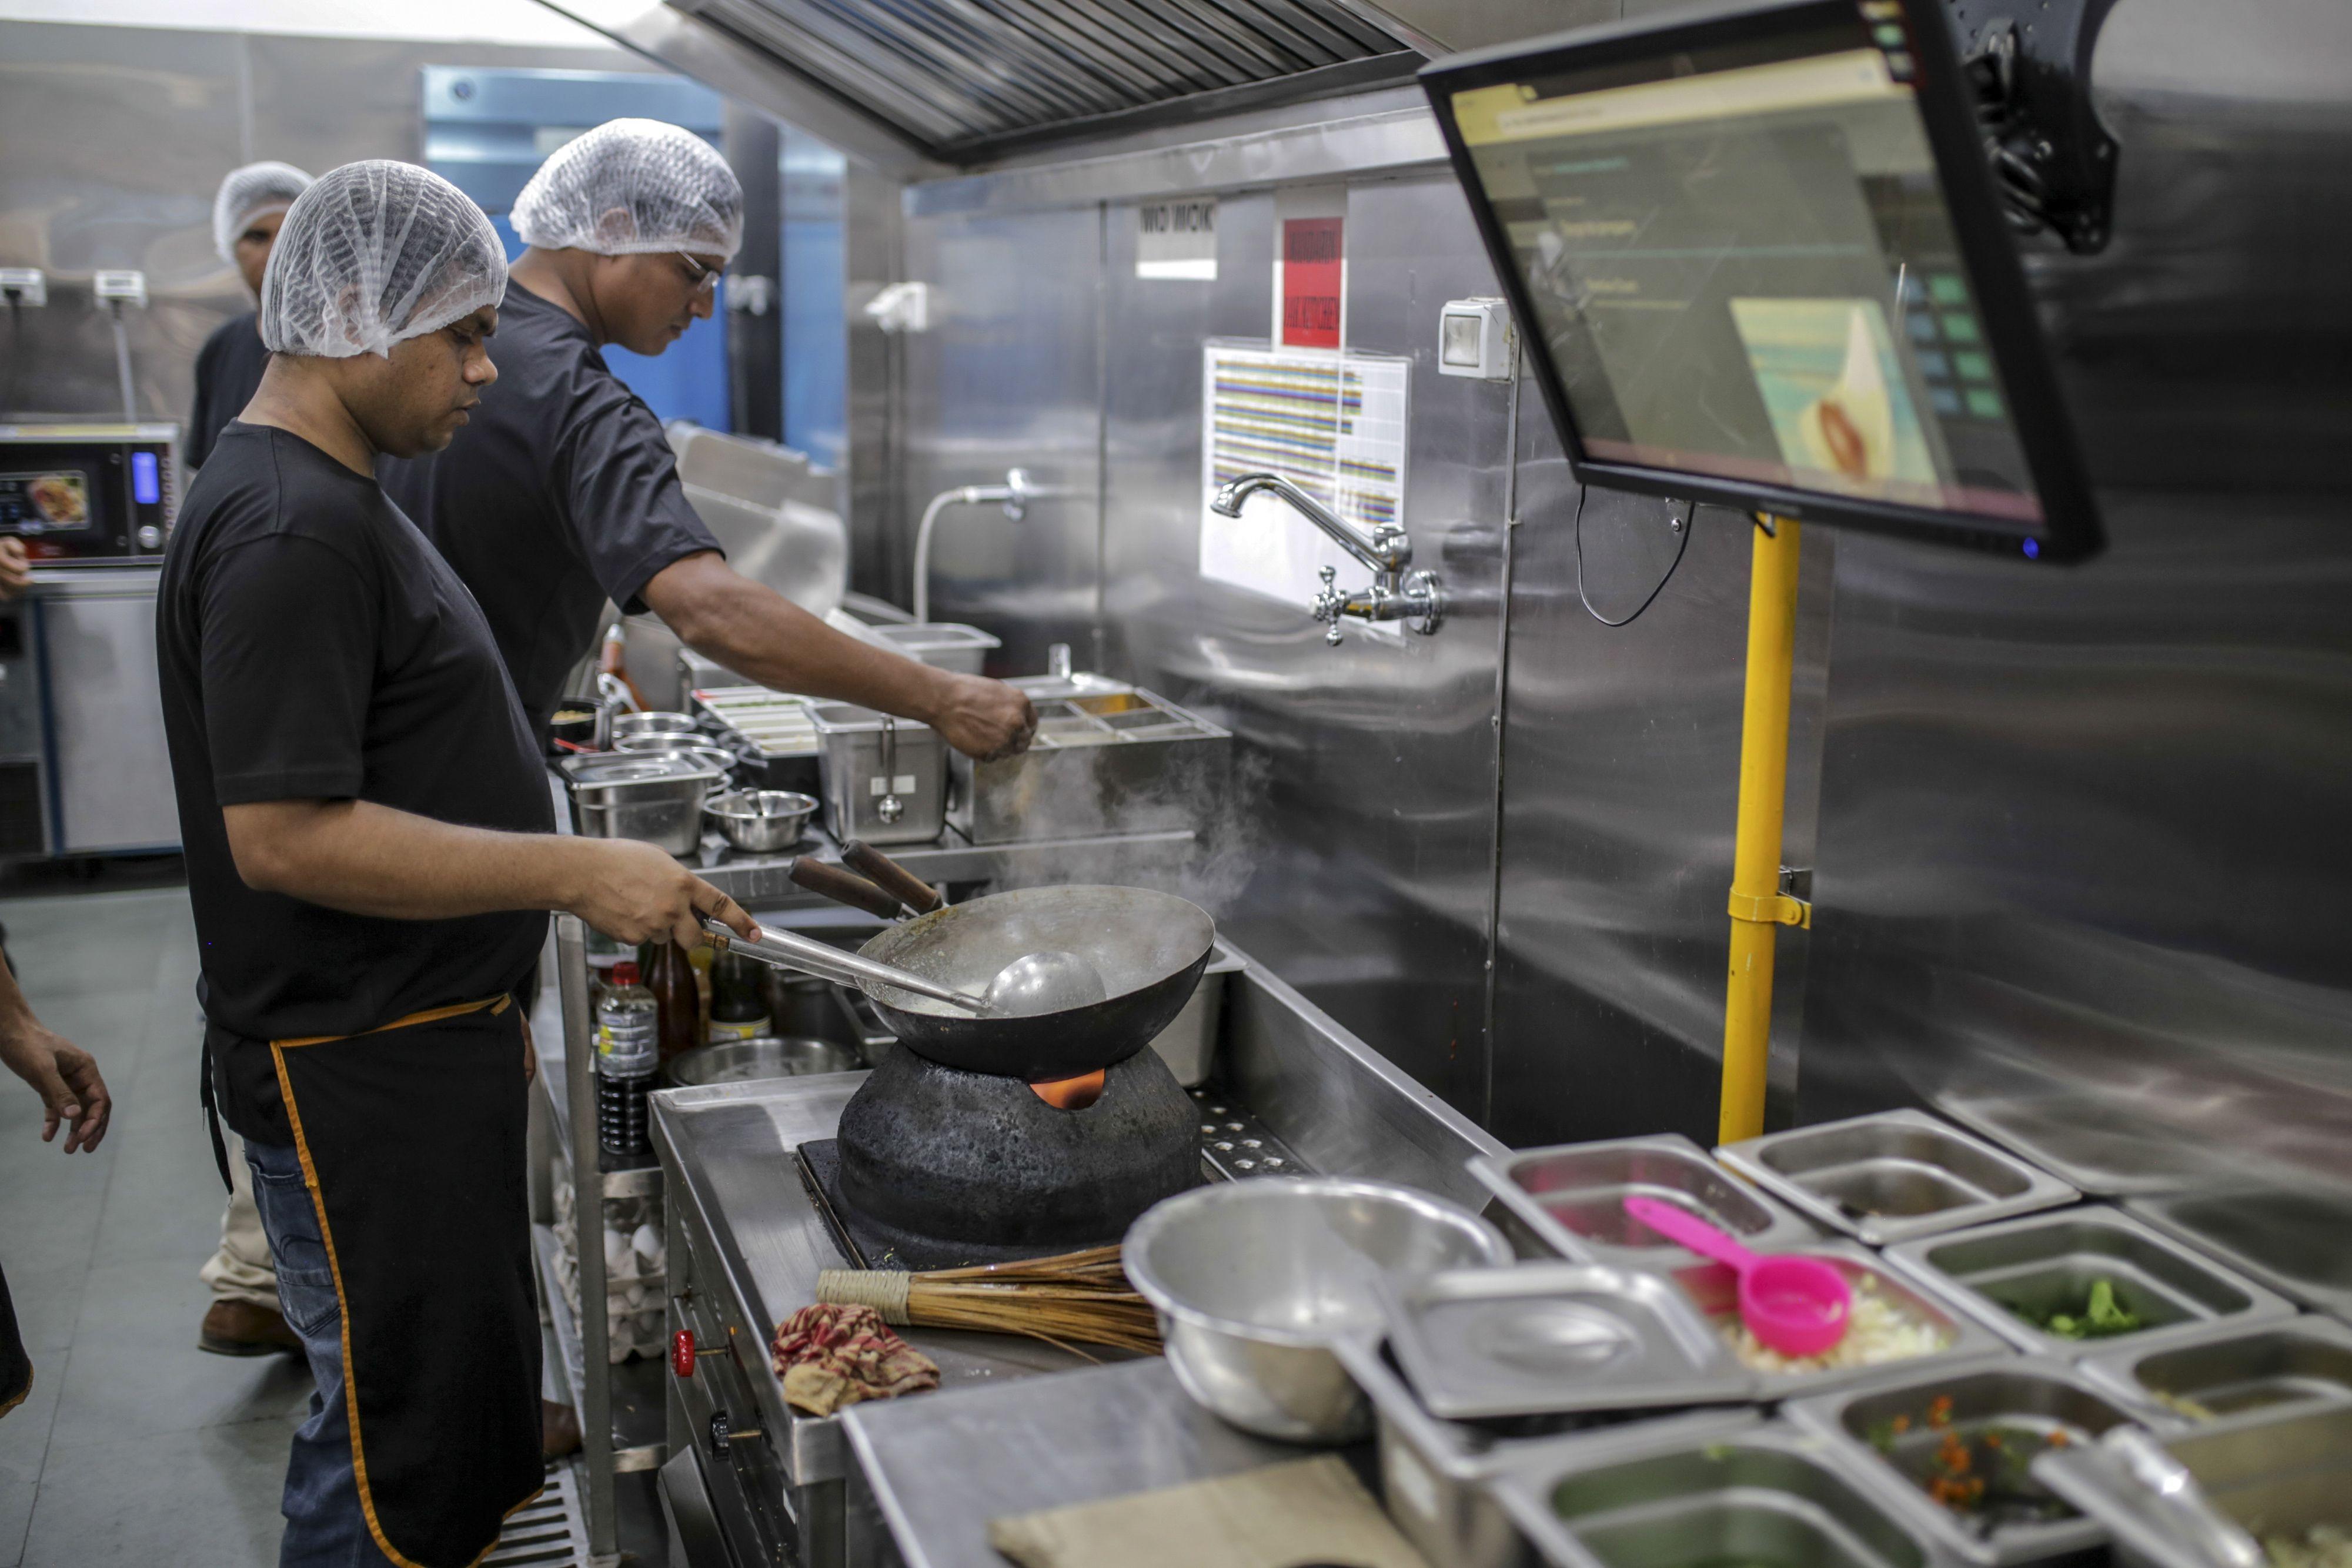 India's Swiggy bets big on cloud kitchens Cloud kitchen